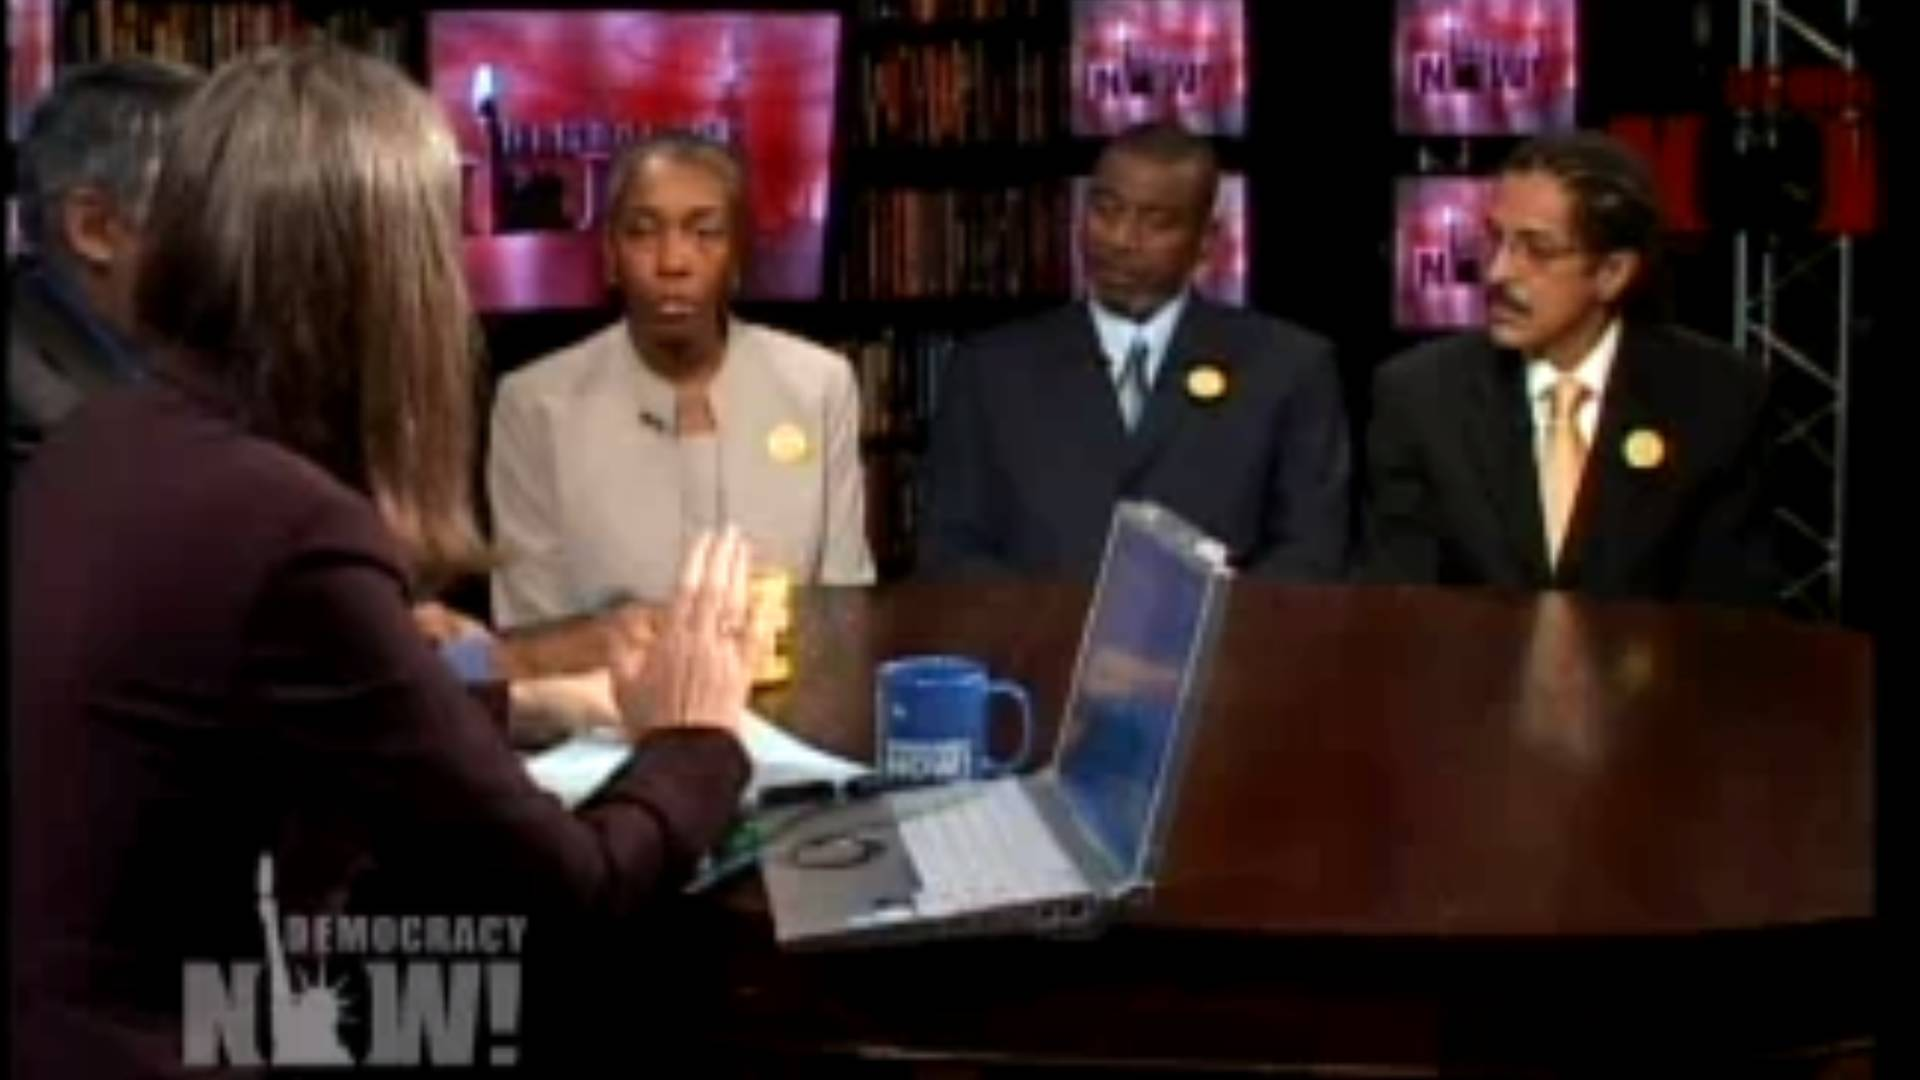 Former Black Panther Details Brutal Police Torture to Extract